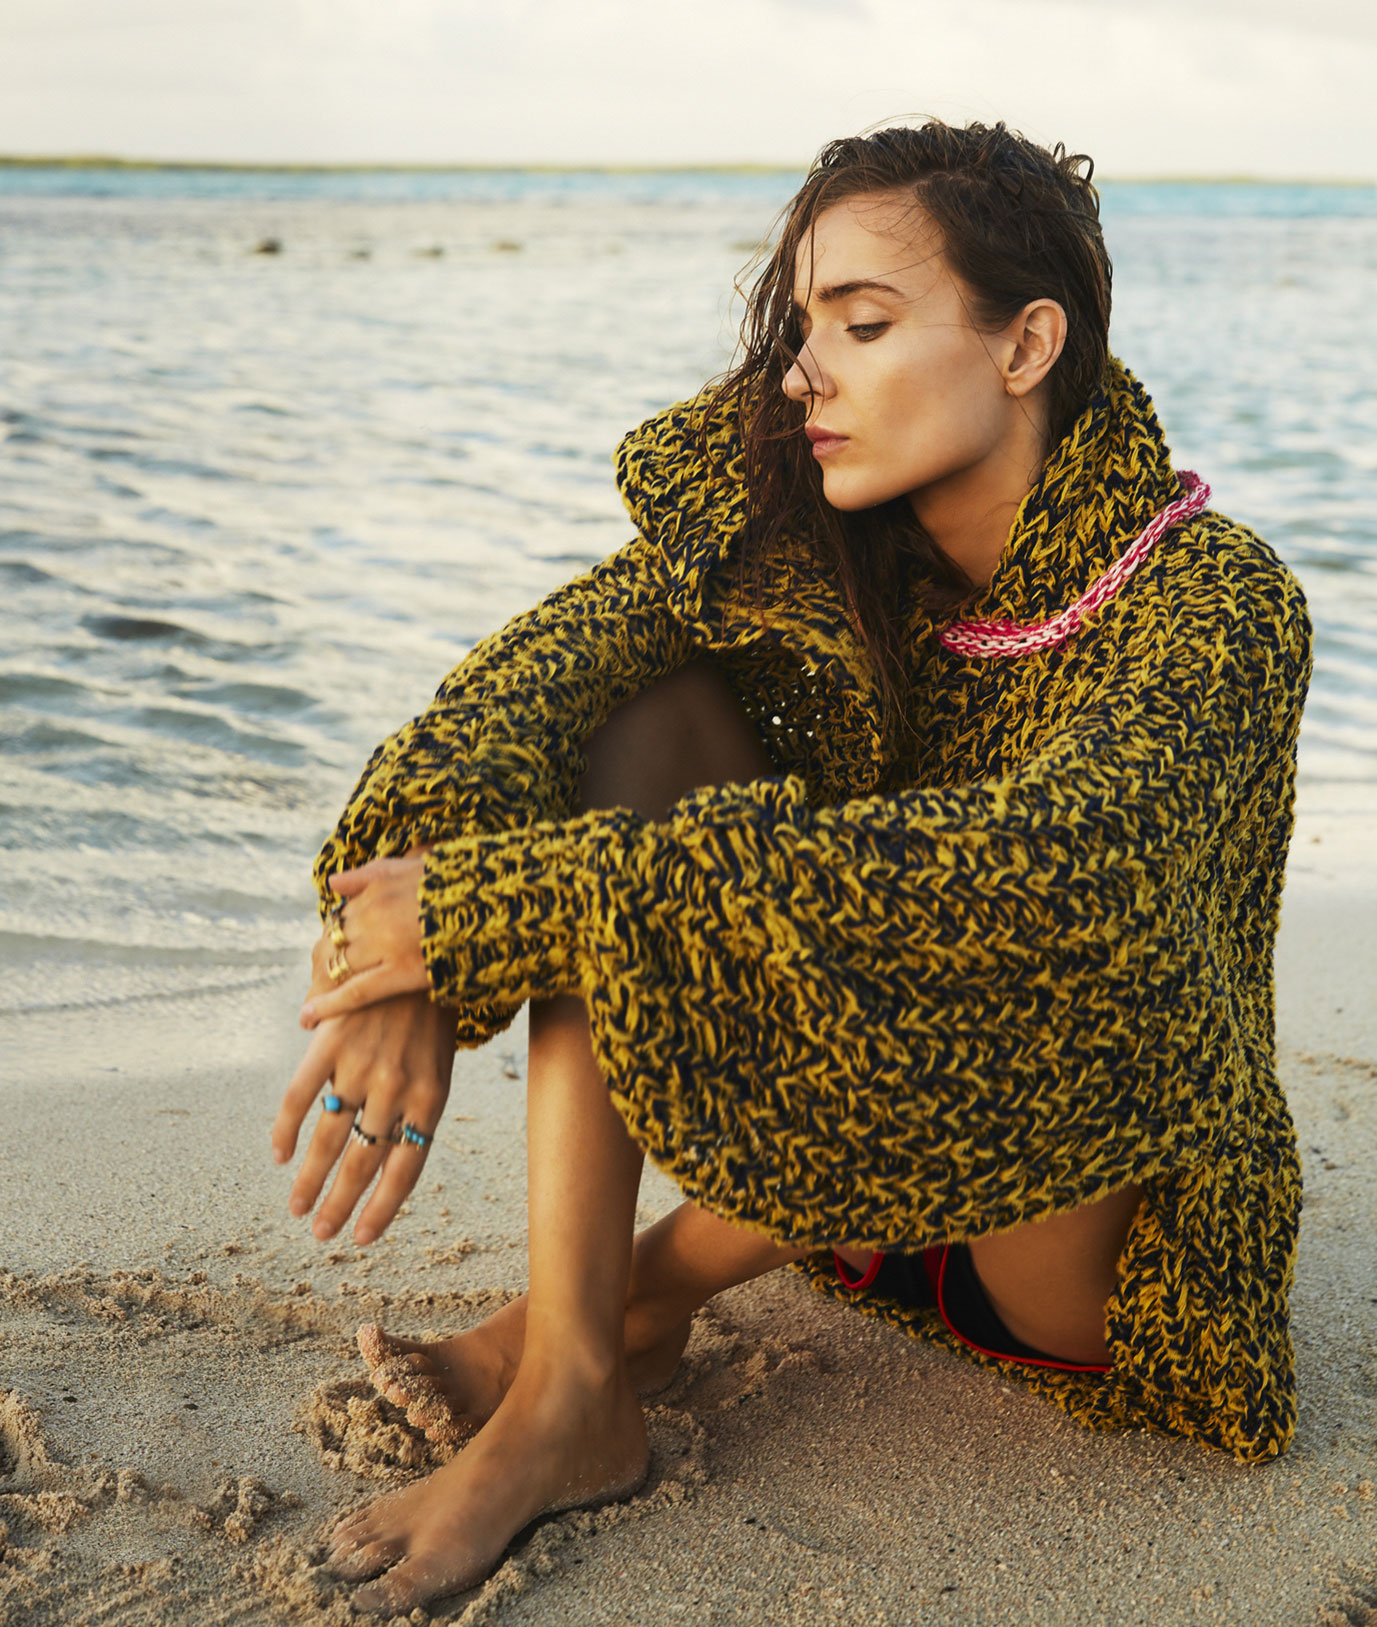 Lynn Palm by Katelijne Verbruggen / Marie Claire Netherlands june 2018